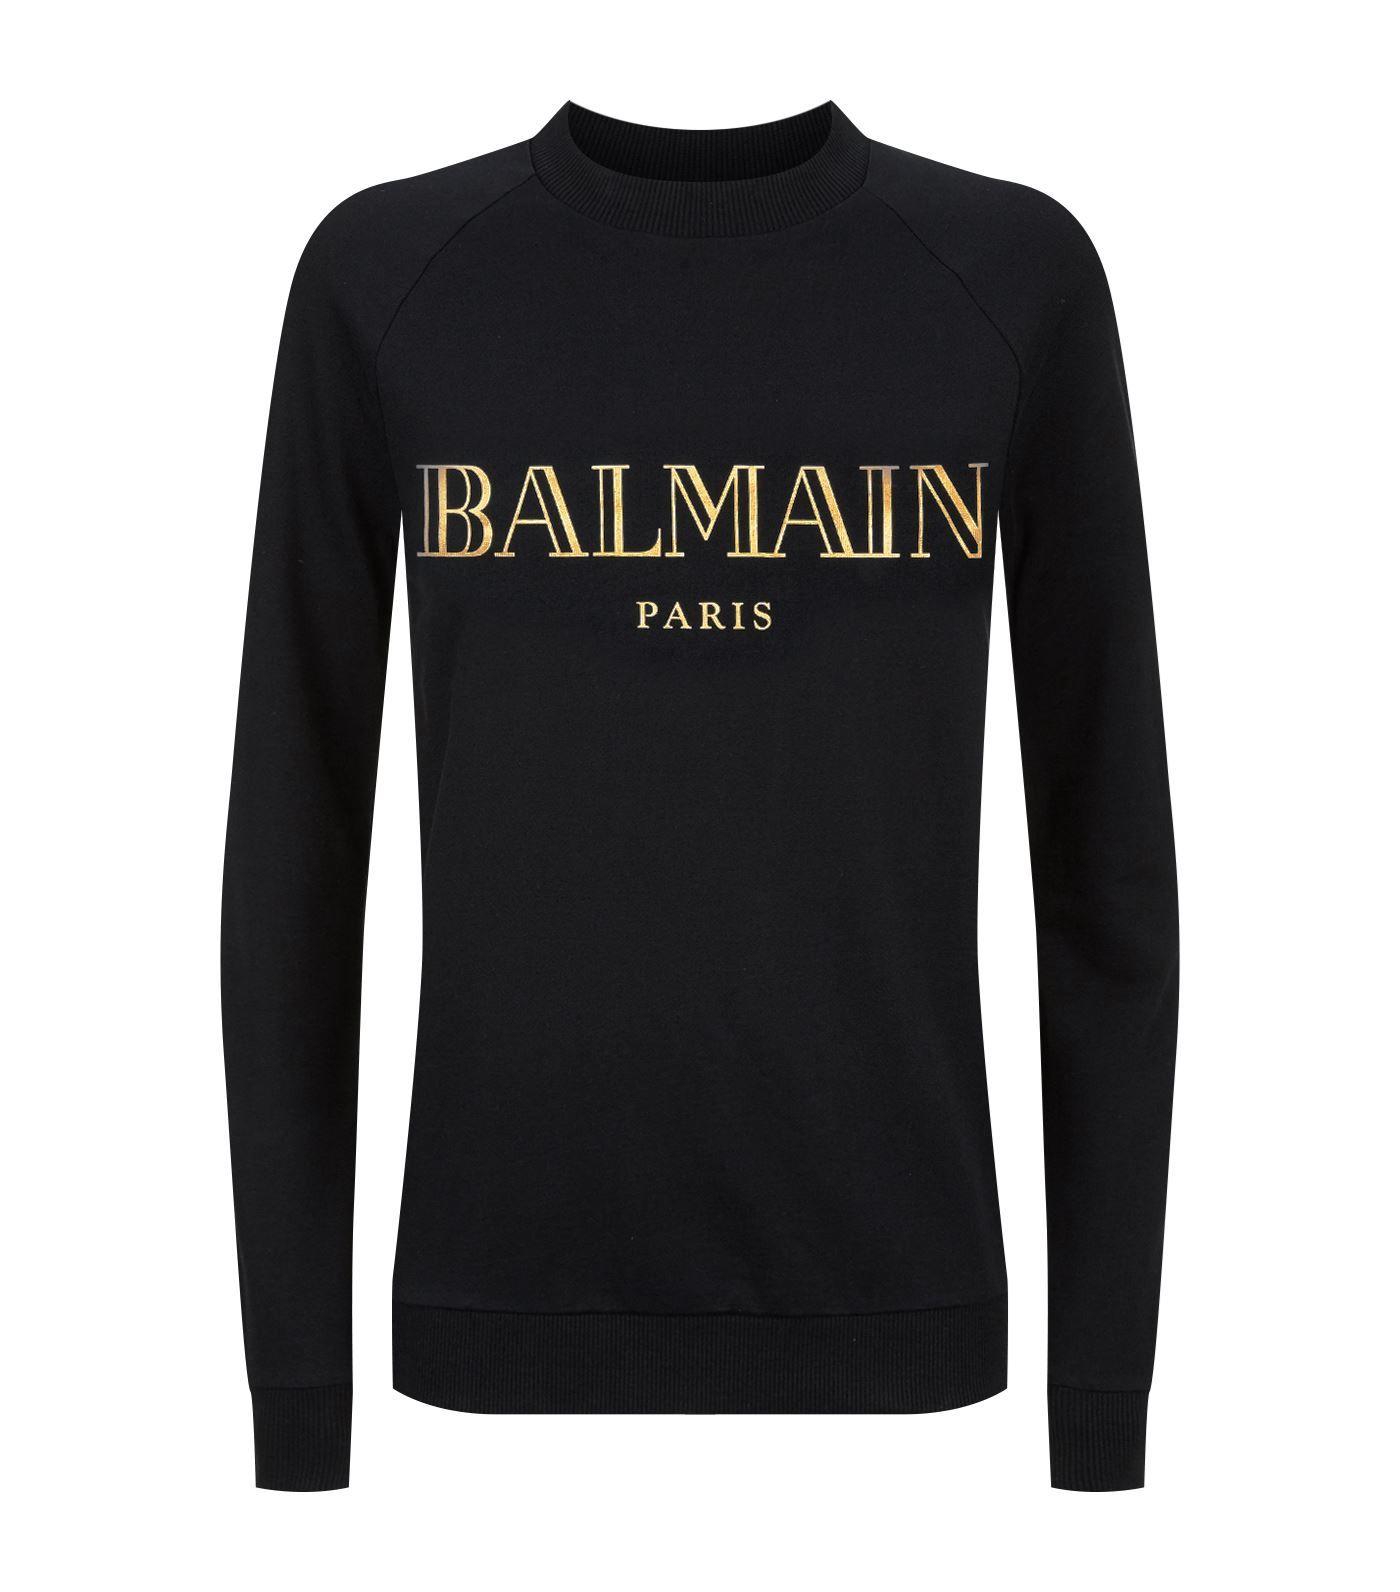 426e414a Logomania Bergdorf Goodman, Vogue, Balmain, Neckline, Glitter, Denim,  Cotton,